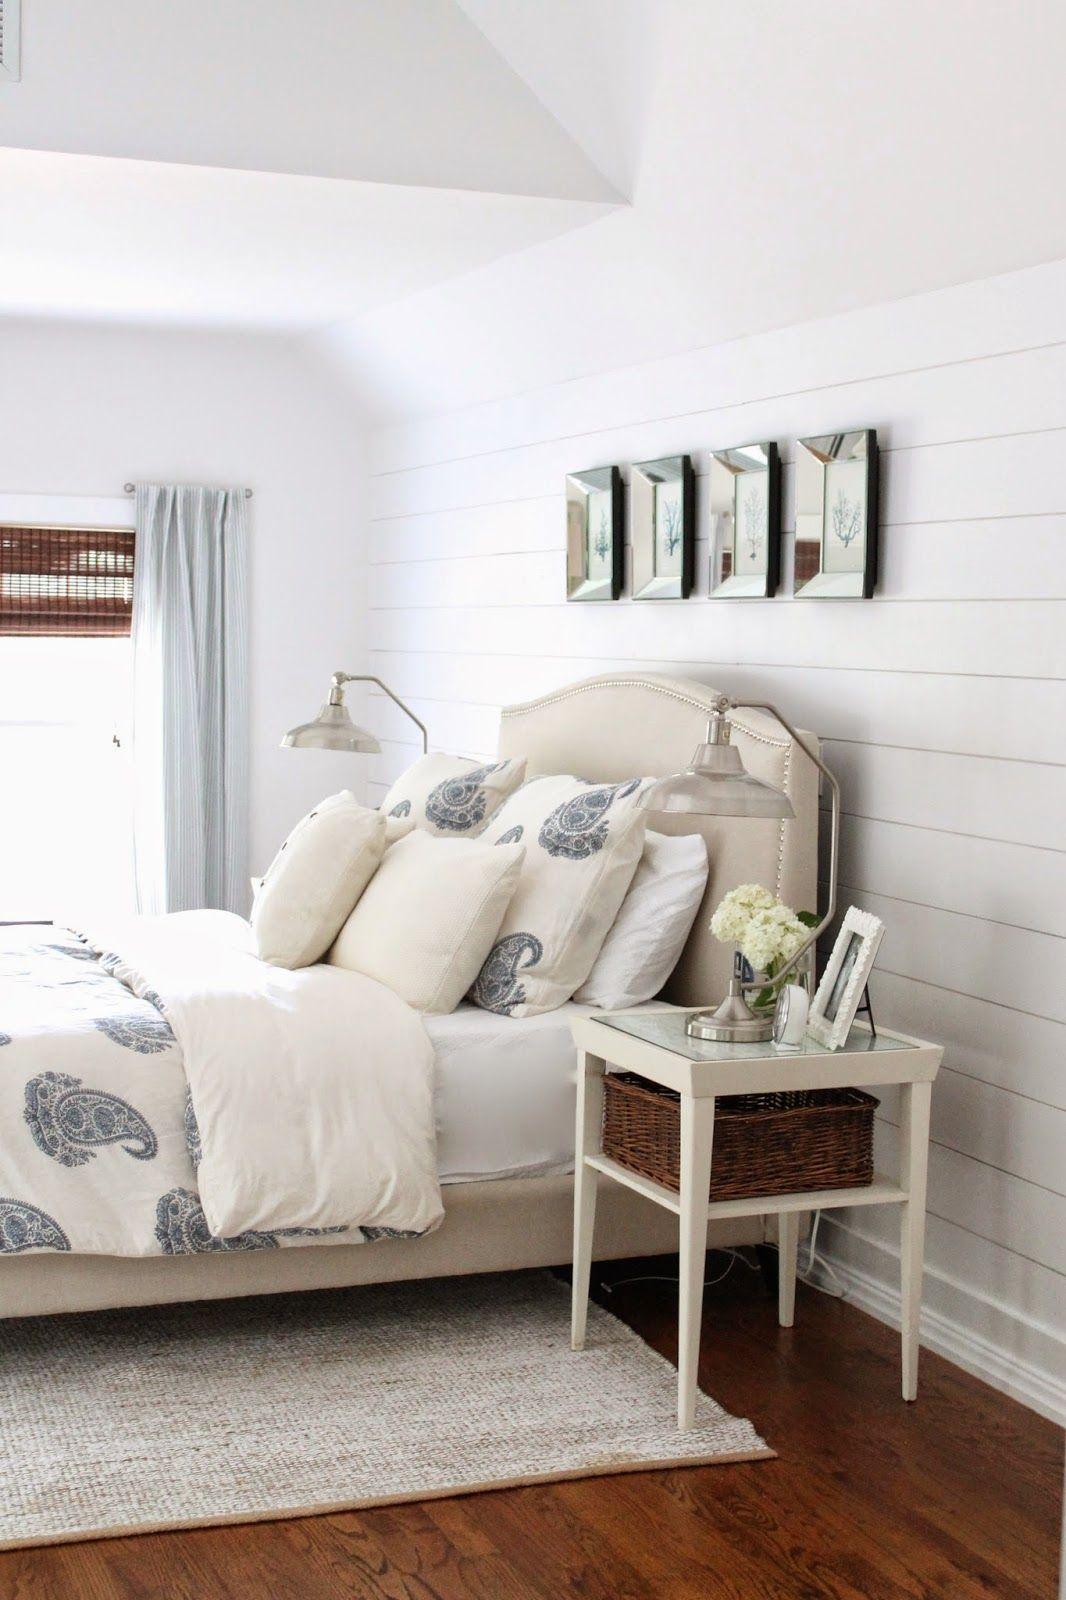 Budget Friendly Master Bedroom Makeover Inspiration!